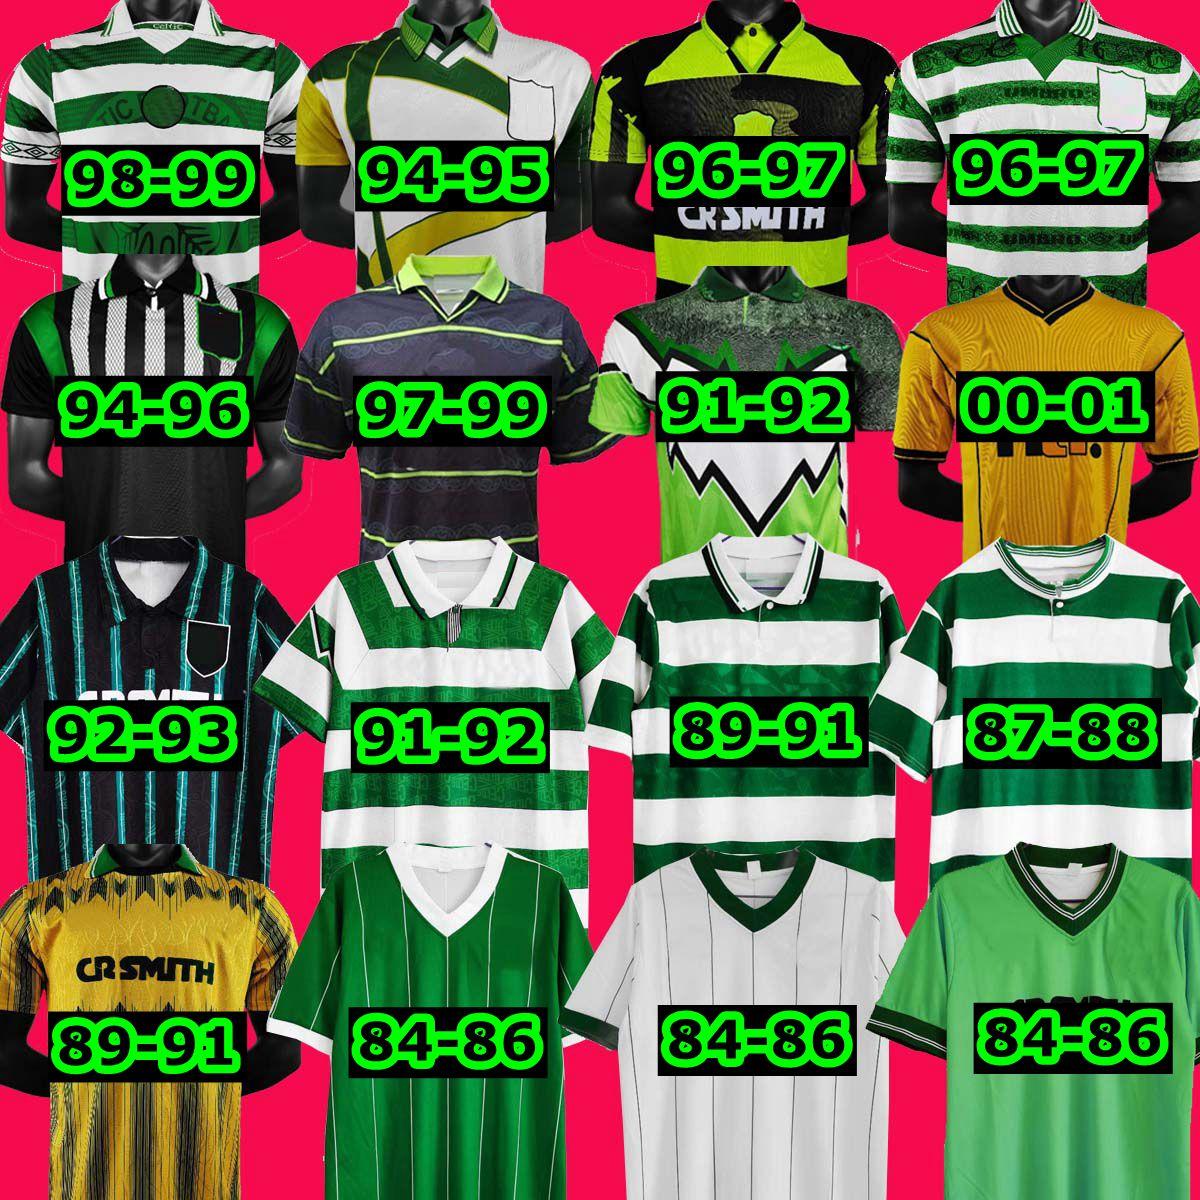 1984 1986 1996 06 08 Celtic Retro Jersey 1991 1993 1998 1999 football shirts LARSSON Classic Vintage Sutton 1995 1997 home away third